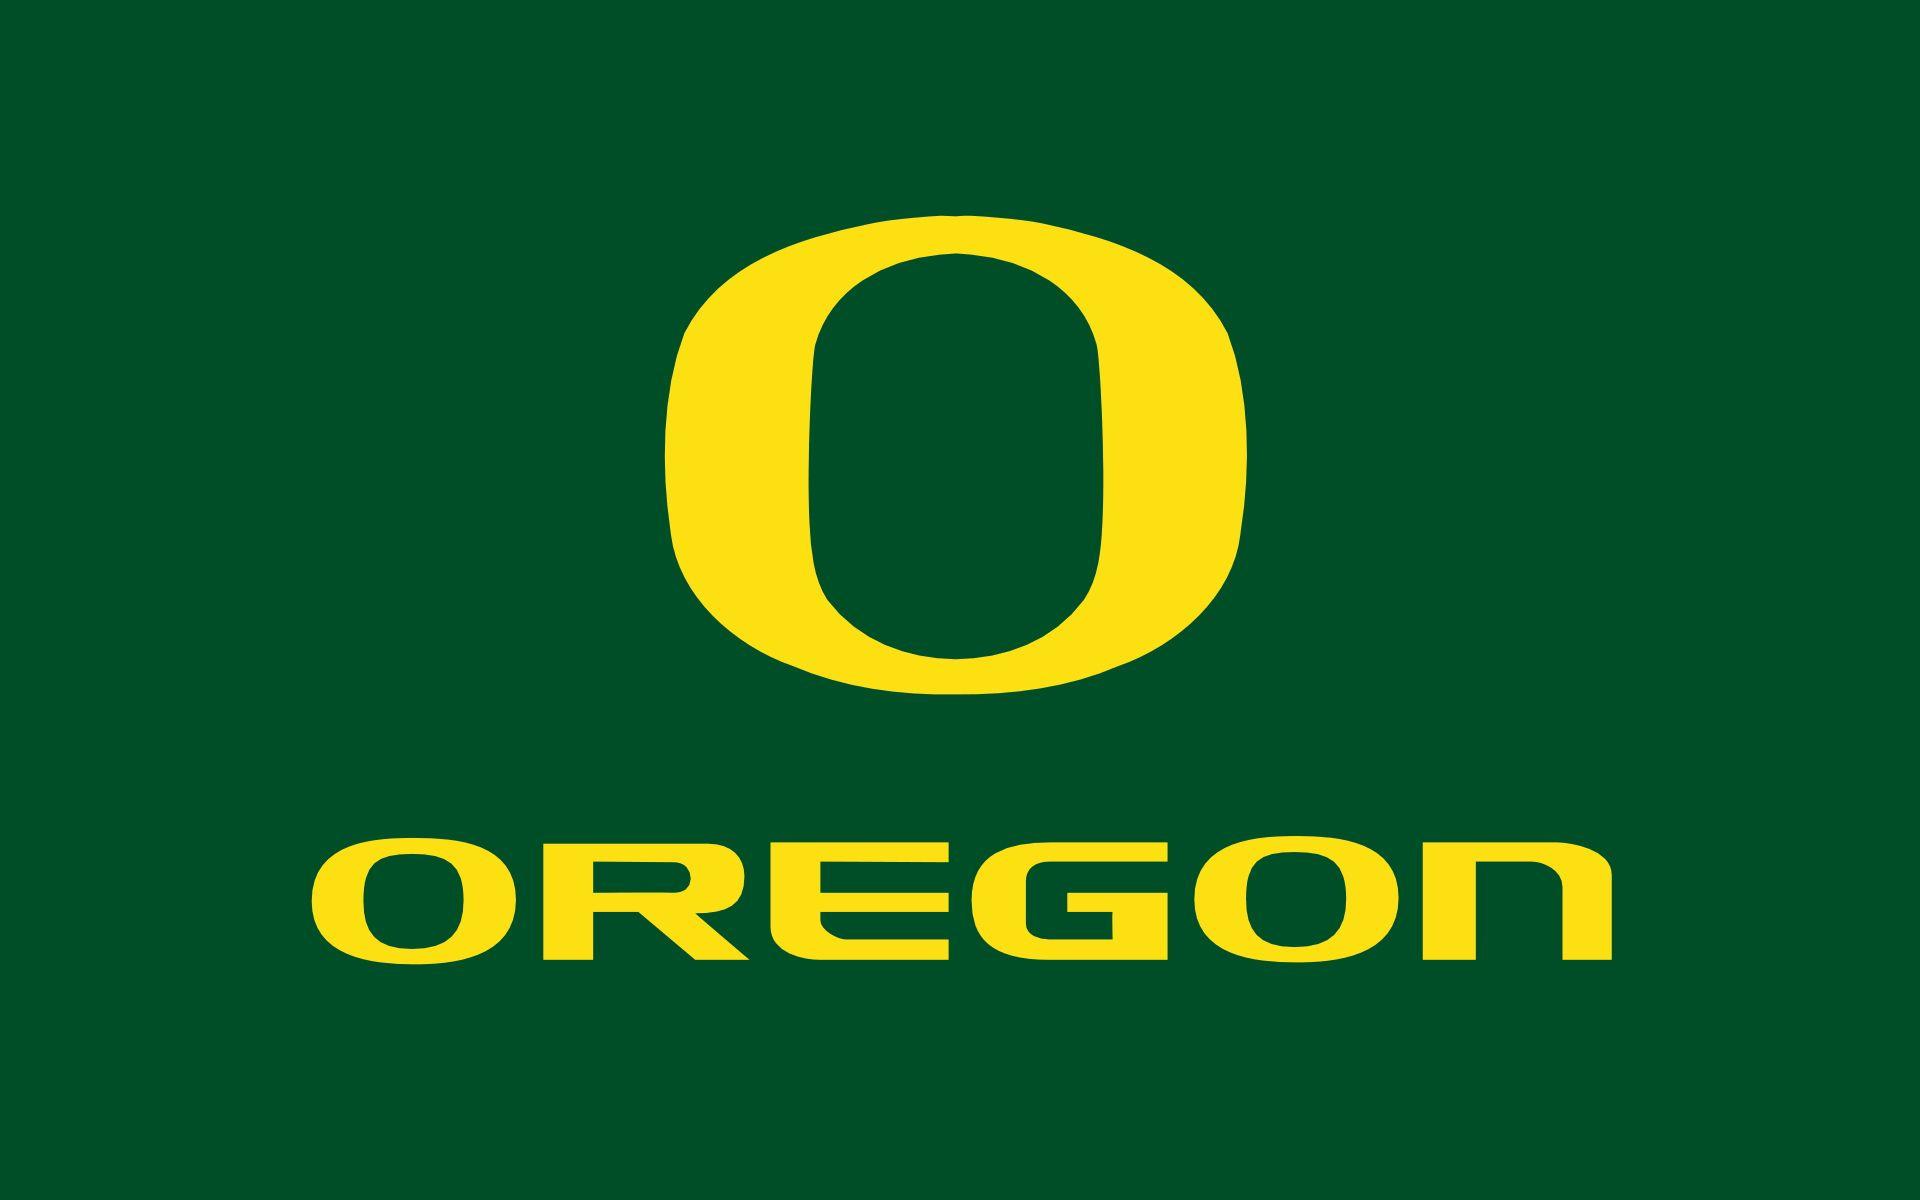 Oregon Ducks Wallpaper